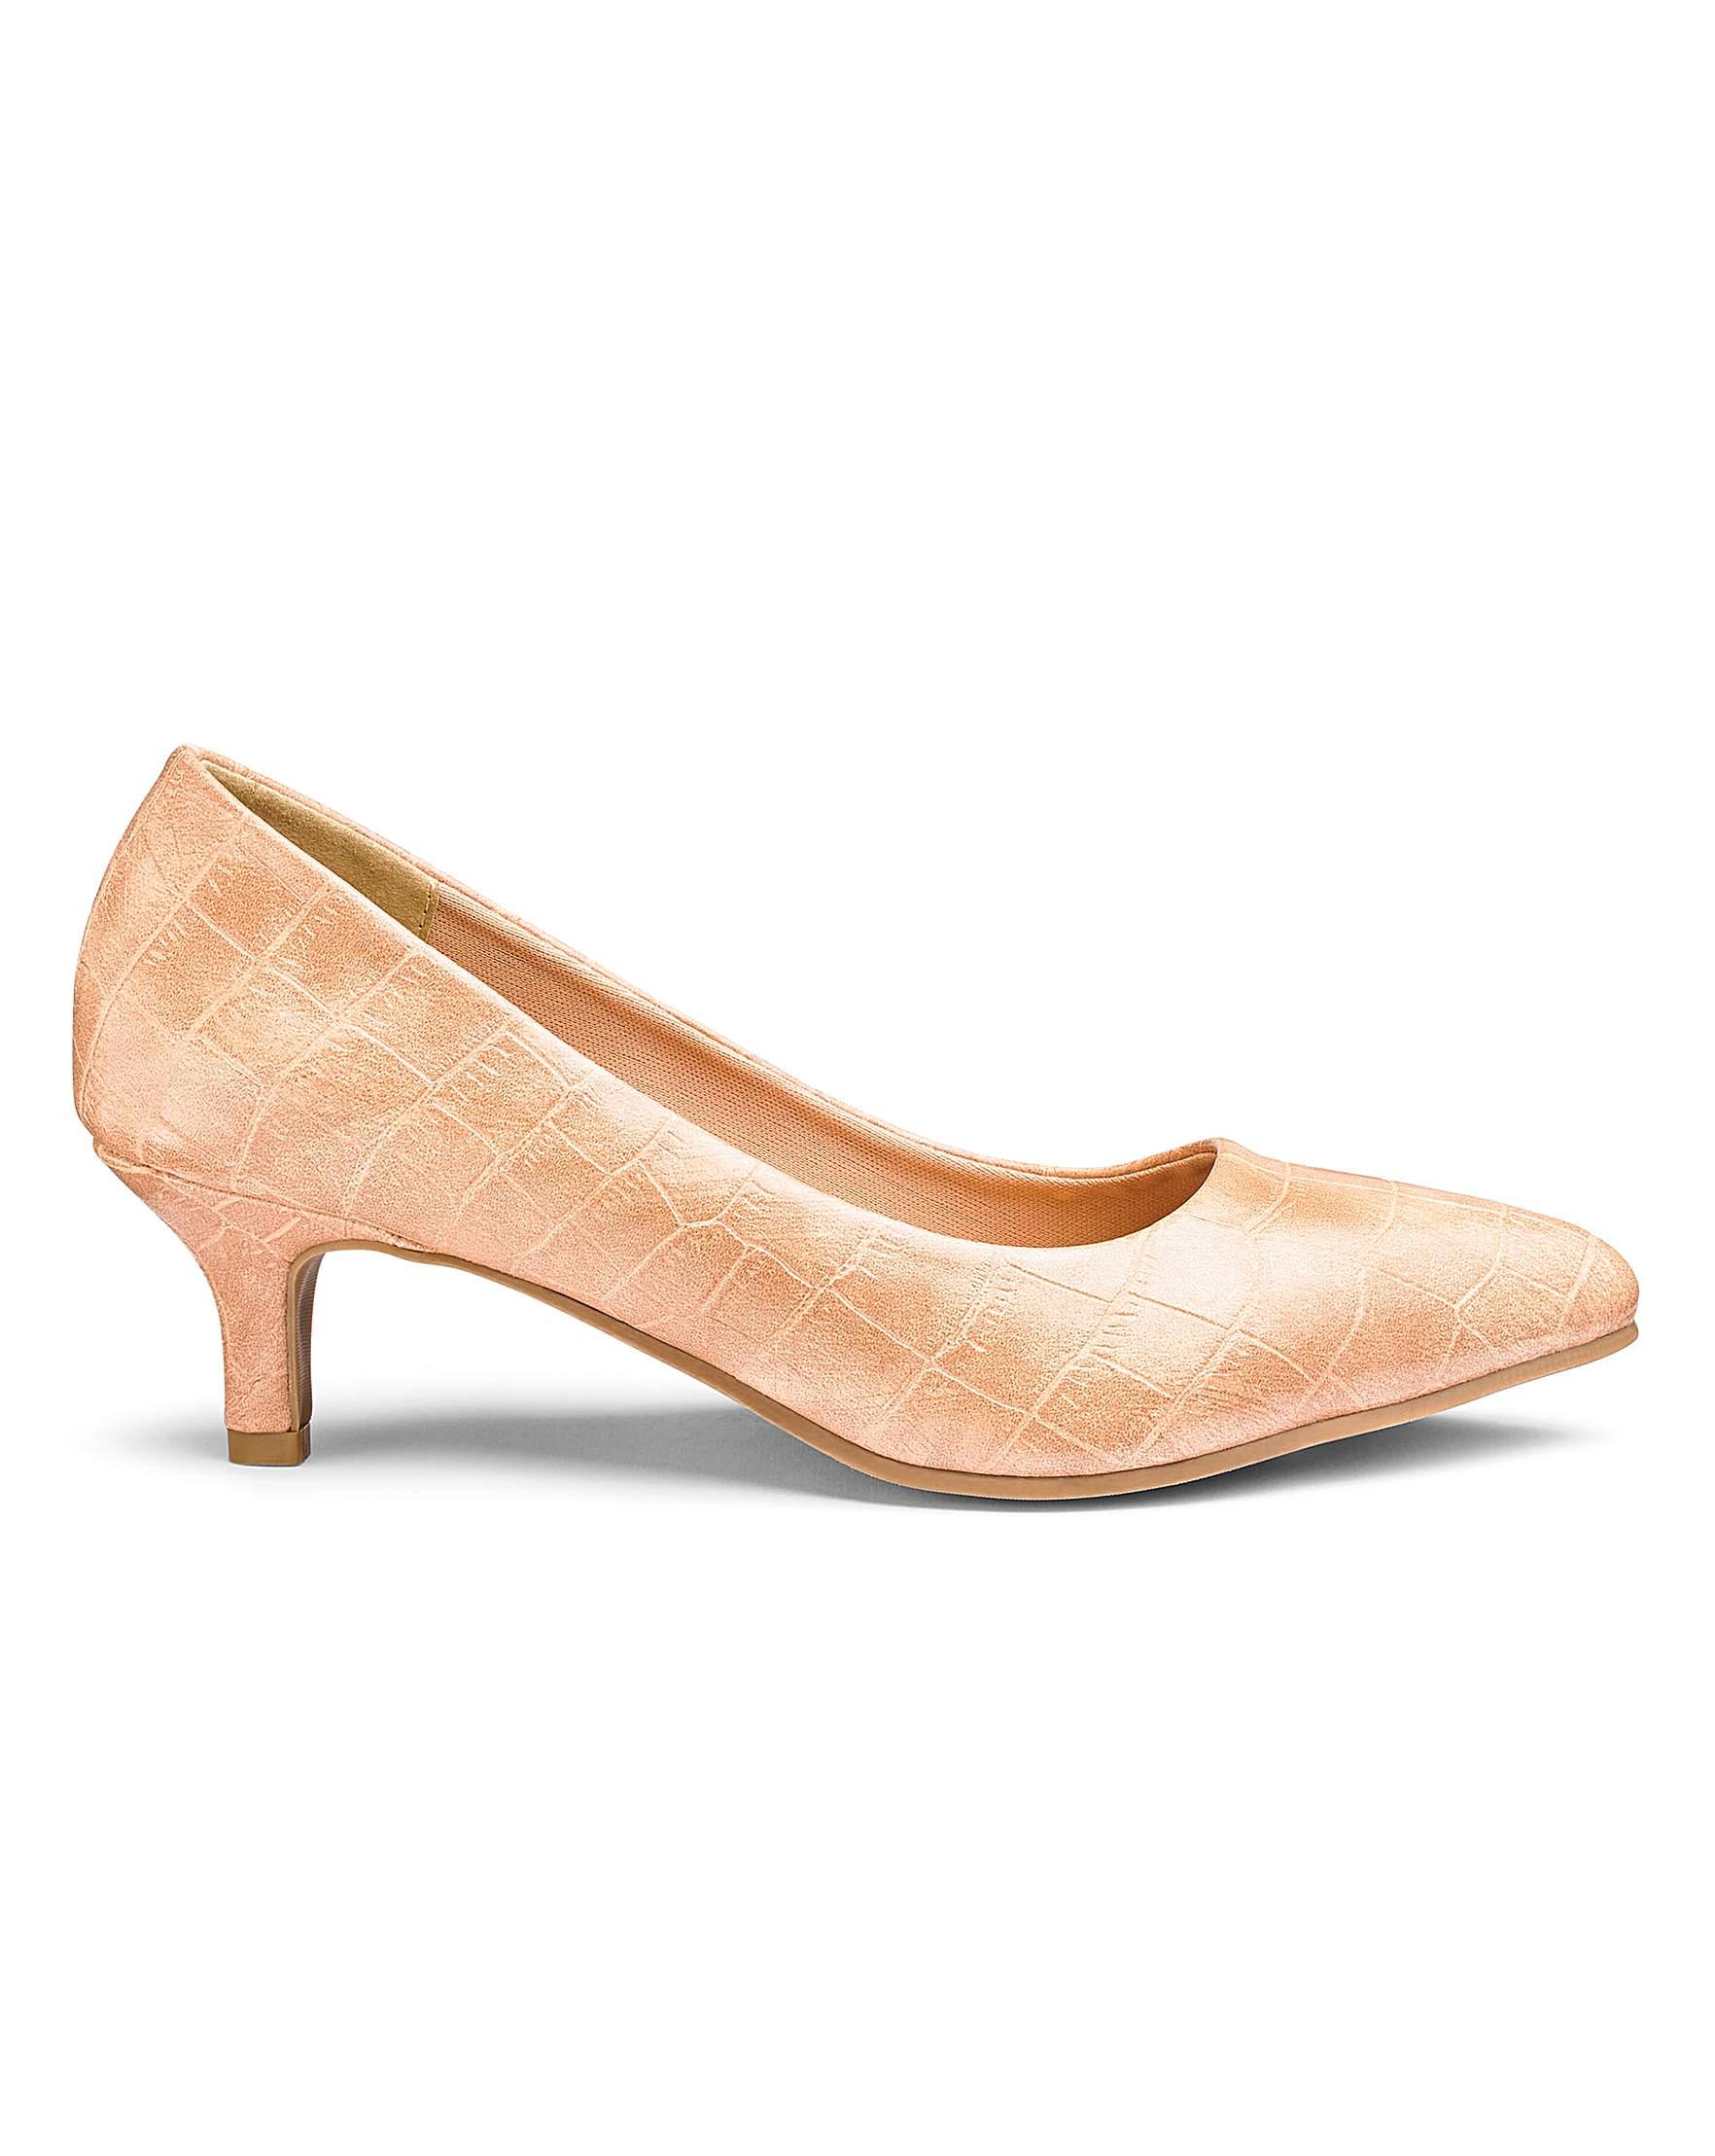 35b4f9db99b Slip On Kitten Heel Court Shoes Extra Wide EEE Fit